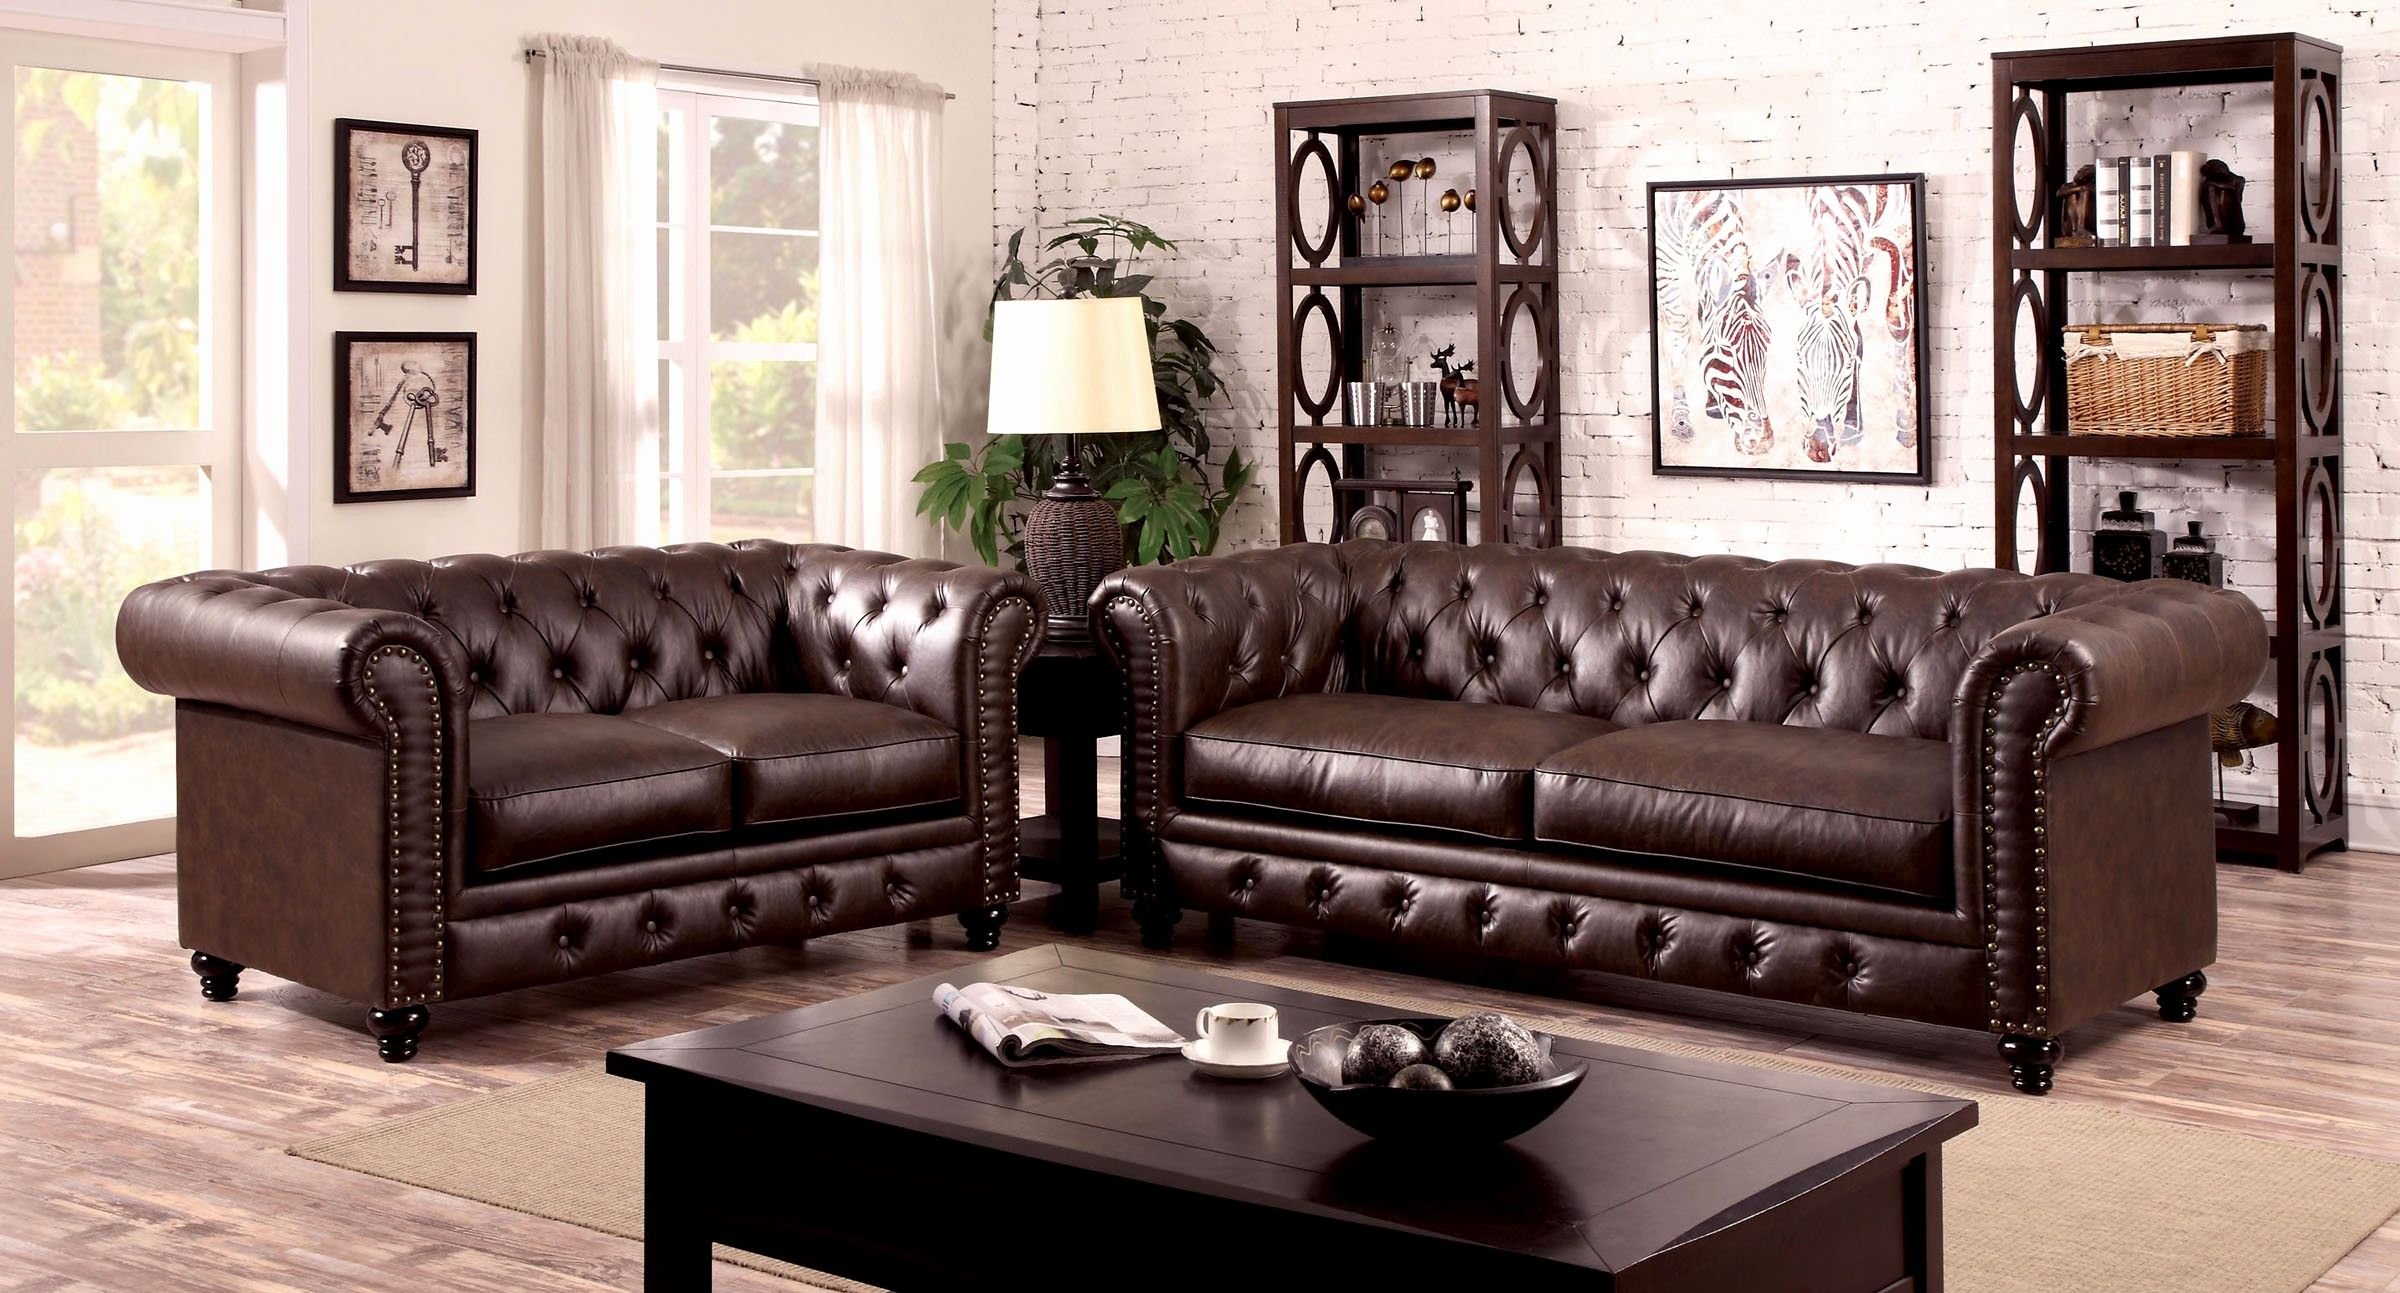 Awesome Burgundy Sofa Set Photograpy Burgundy Sofa Set Luxury Sofa Loveseat  Set Quick Shipd Sets For Cheapsofa Under Burgundy